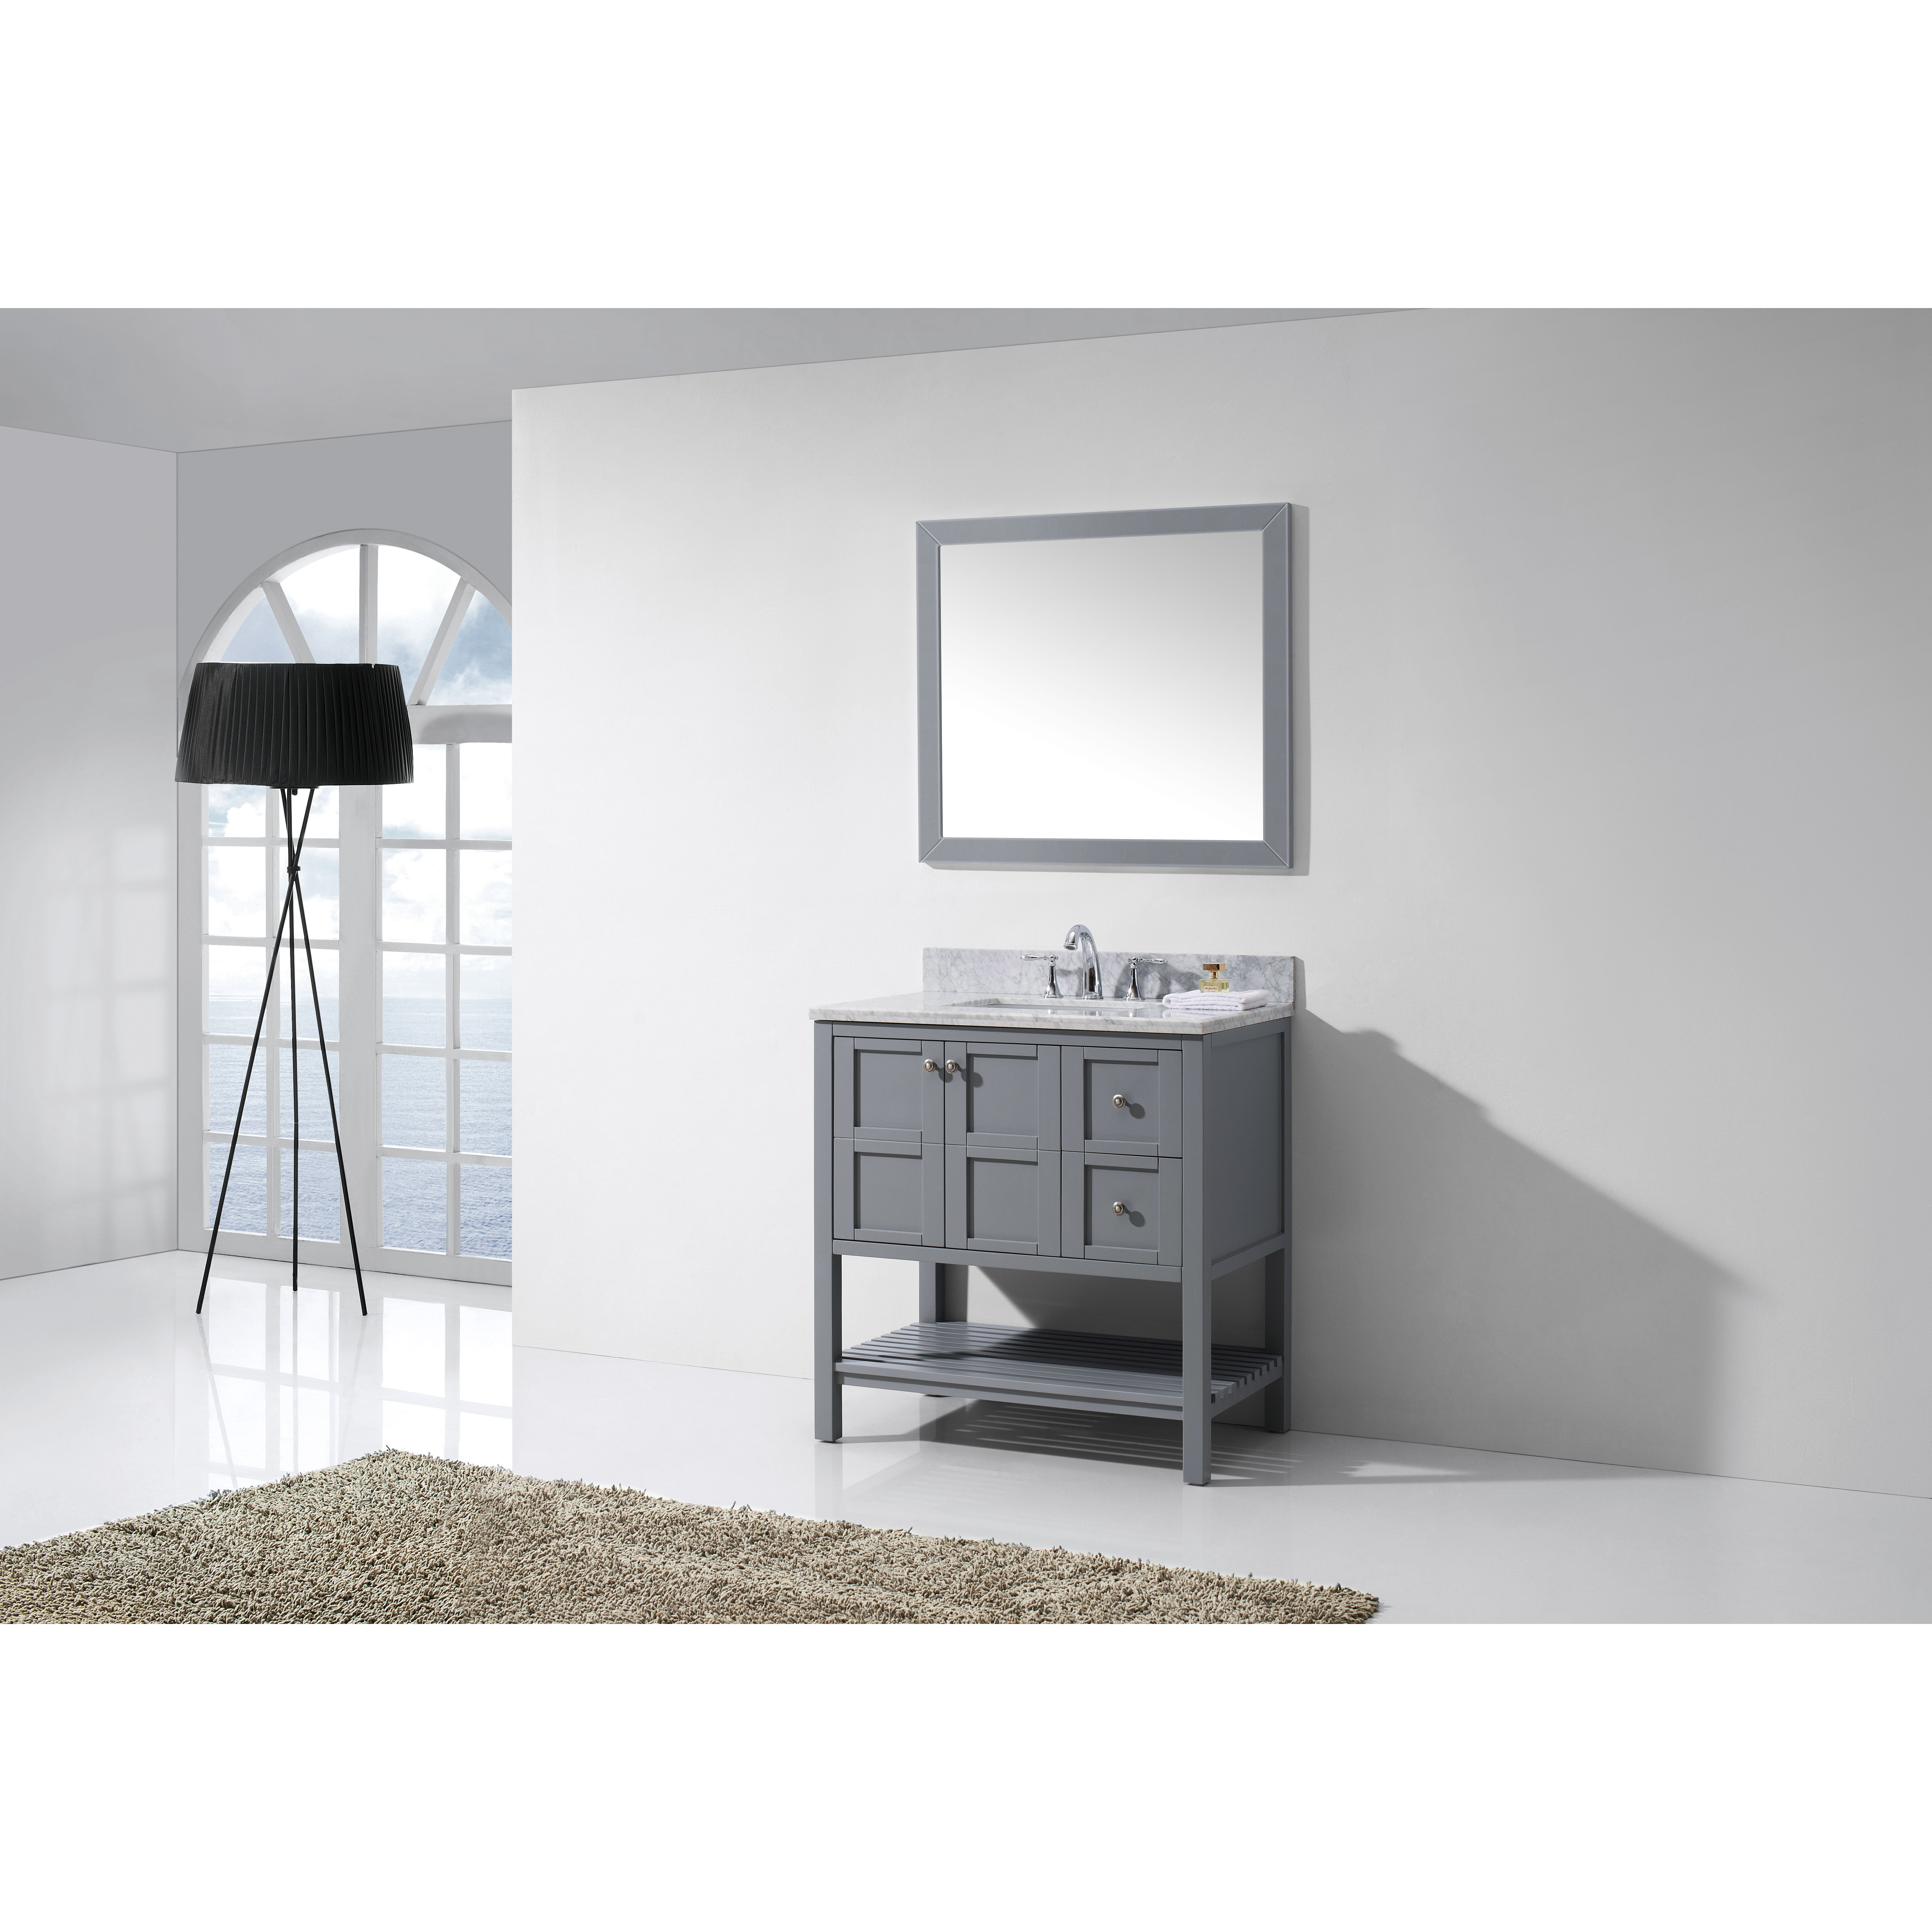 Virtu Winterfell Six Single Bathroom Vanity Set With Carrara White Top And Mirror Reviews